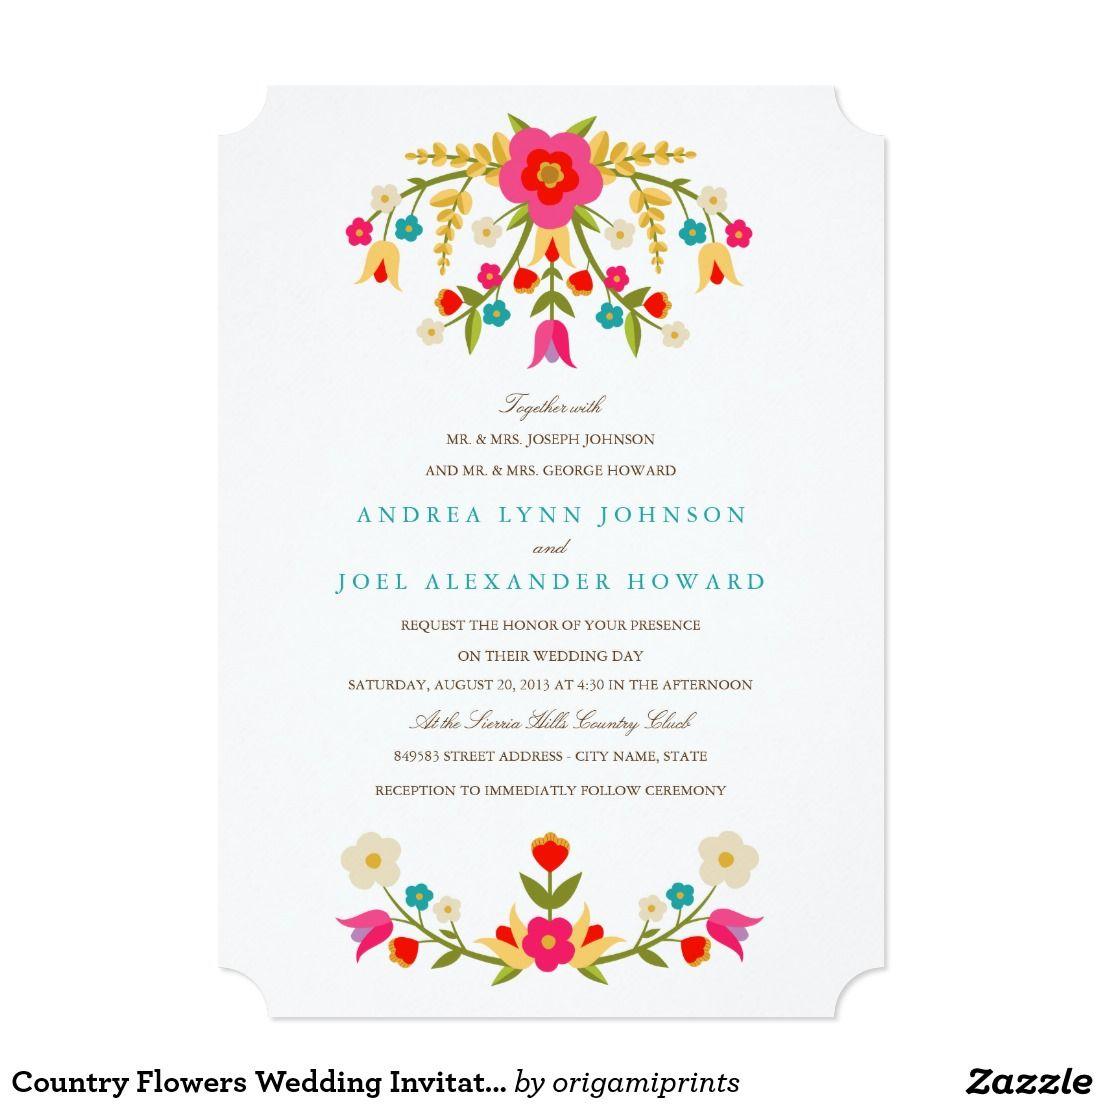 Country Flowers Wedding Invitation